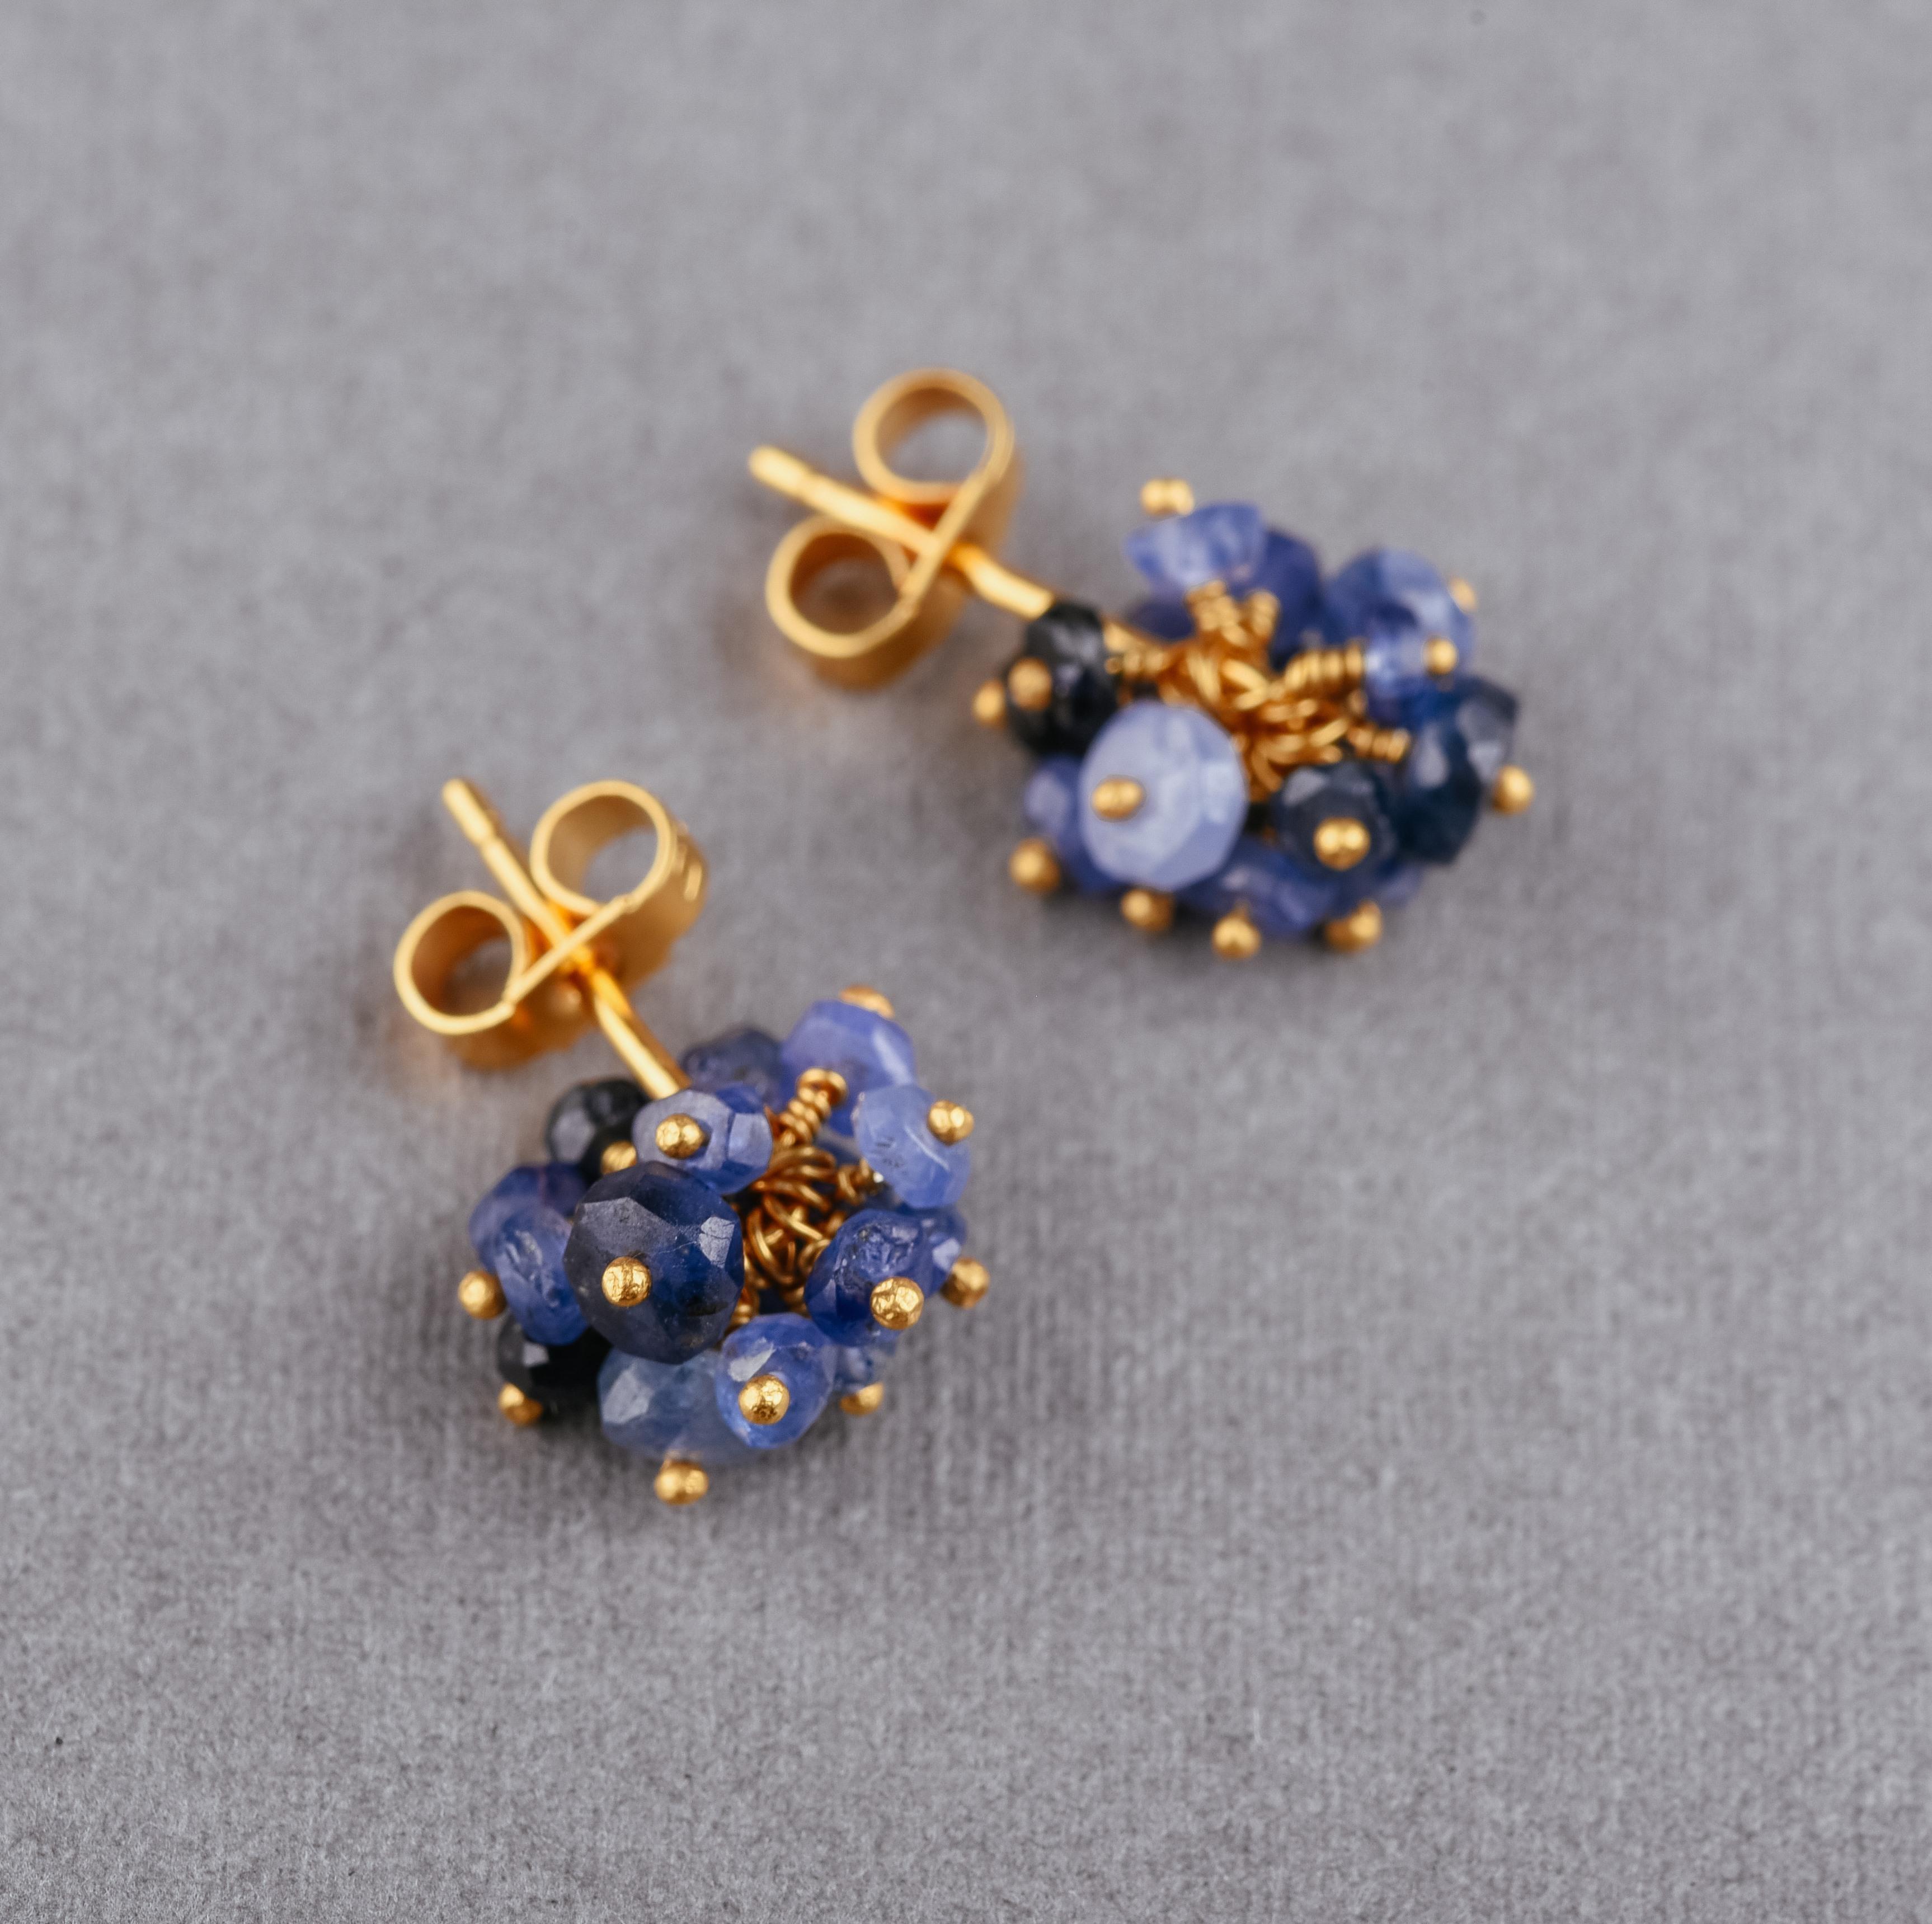 3e9398548 Sapphire and Gold Vermeil Pompom Stud Earrings. display image. Sapphire  Vermeil Pompom Studs